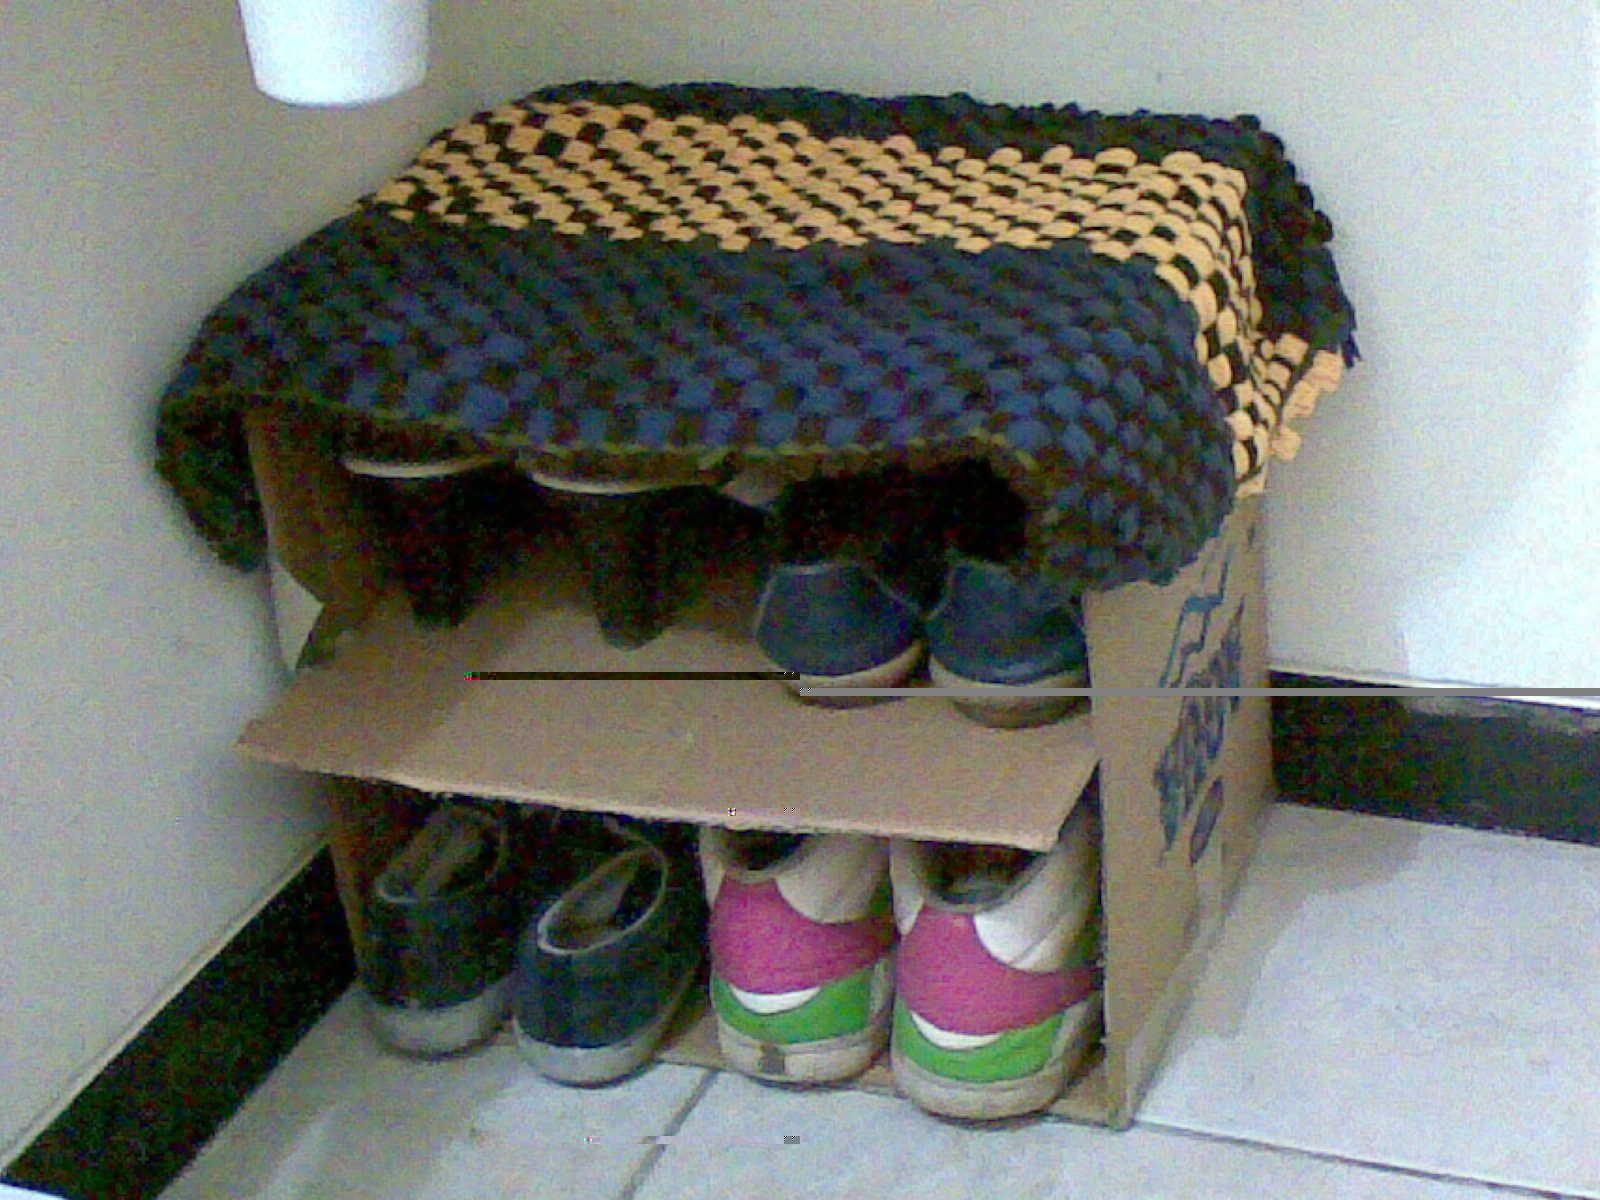 Diy shoe rack cardboard diy shoe rack diy shoes shoe rack